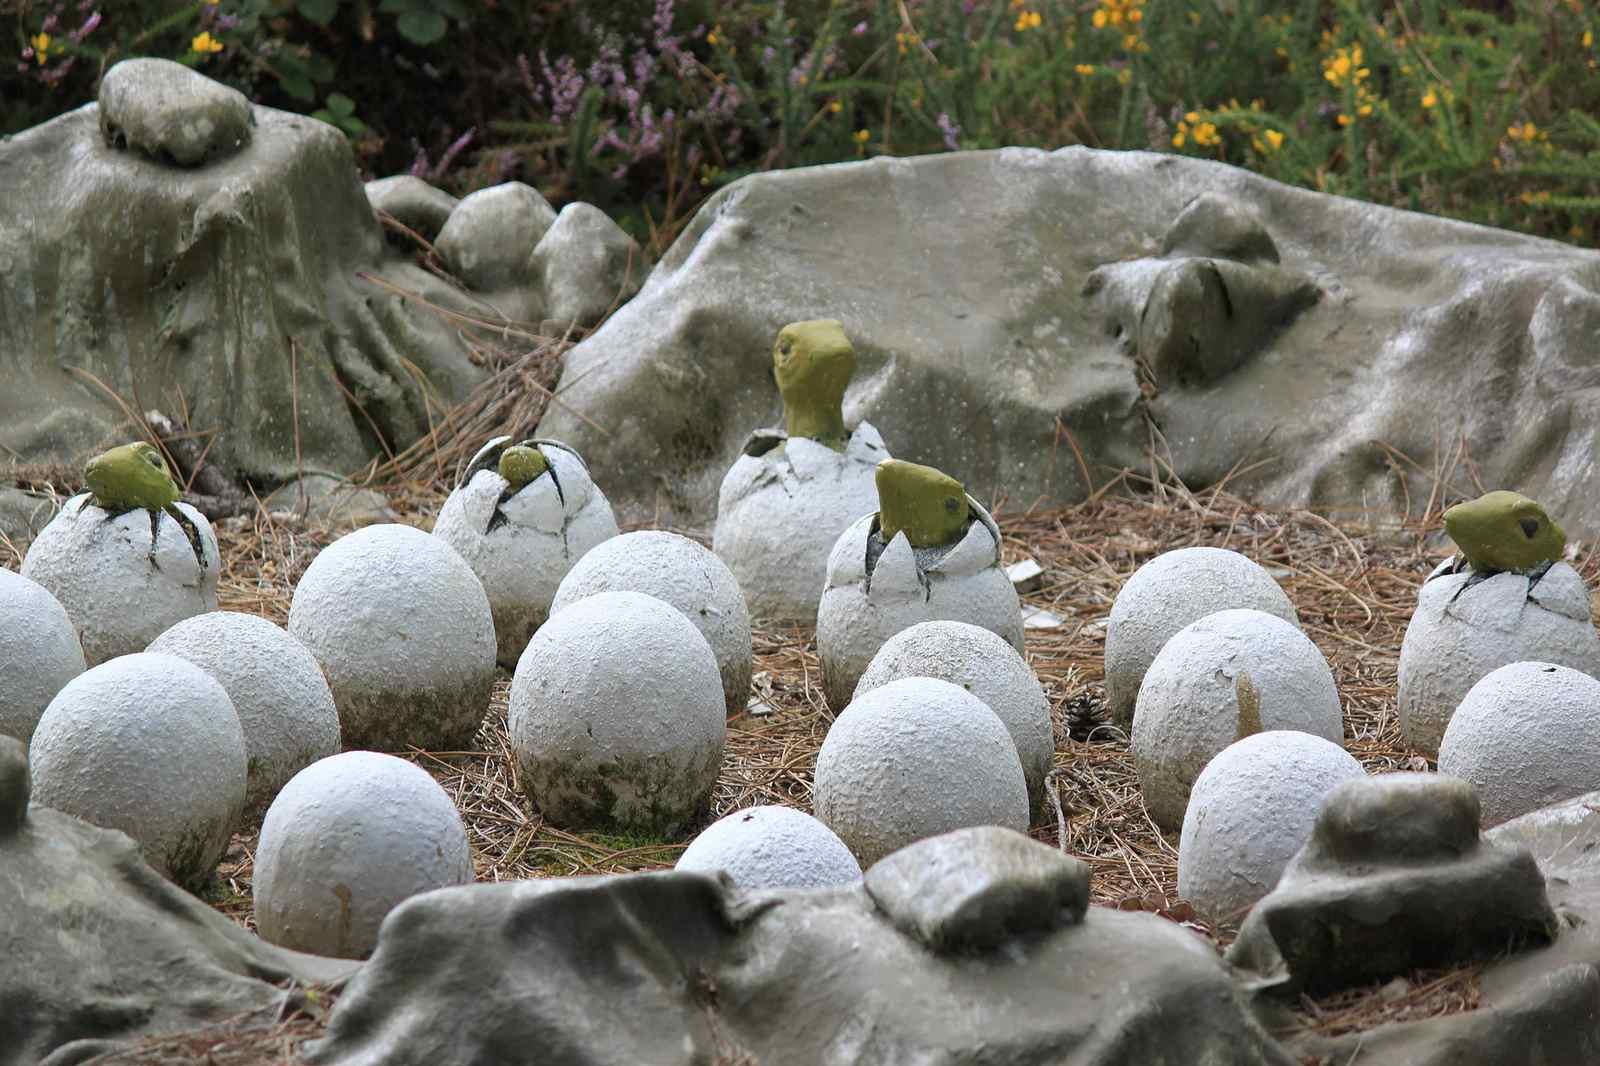 Dinosaur eggs hatching sculpture.